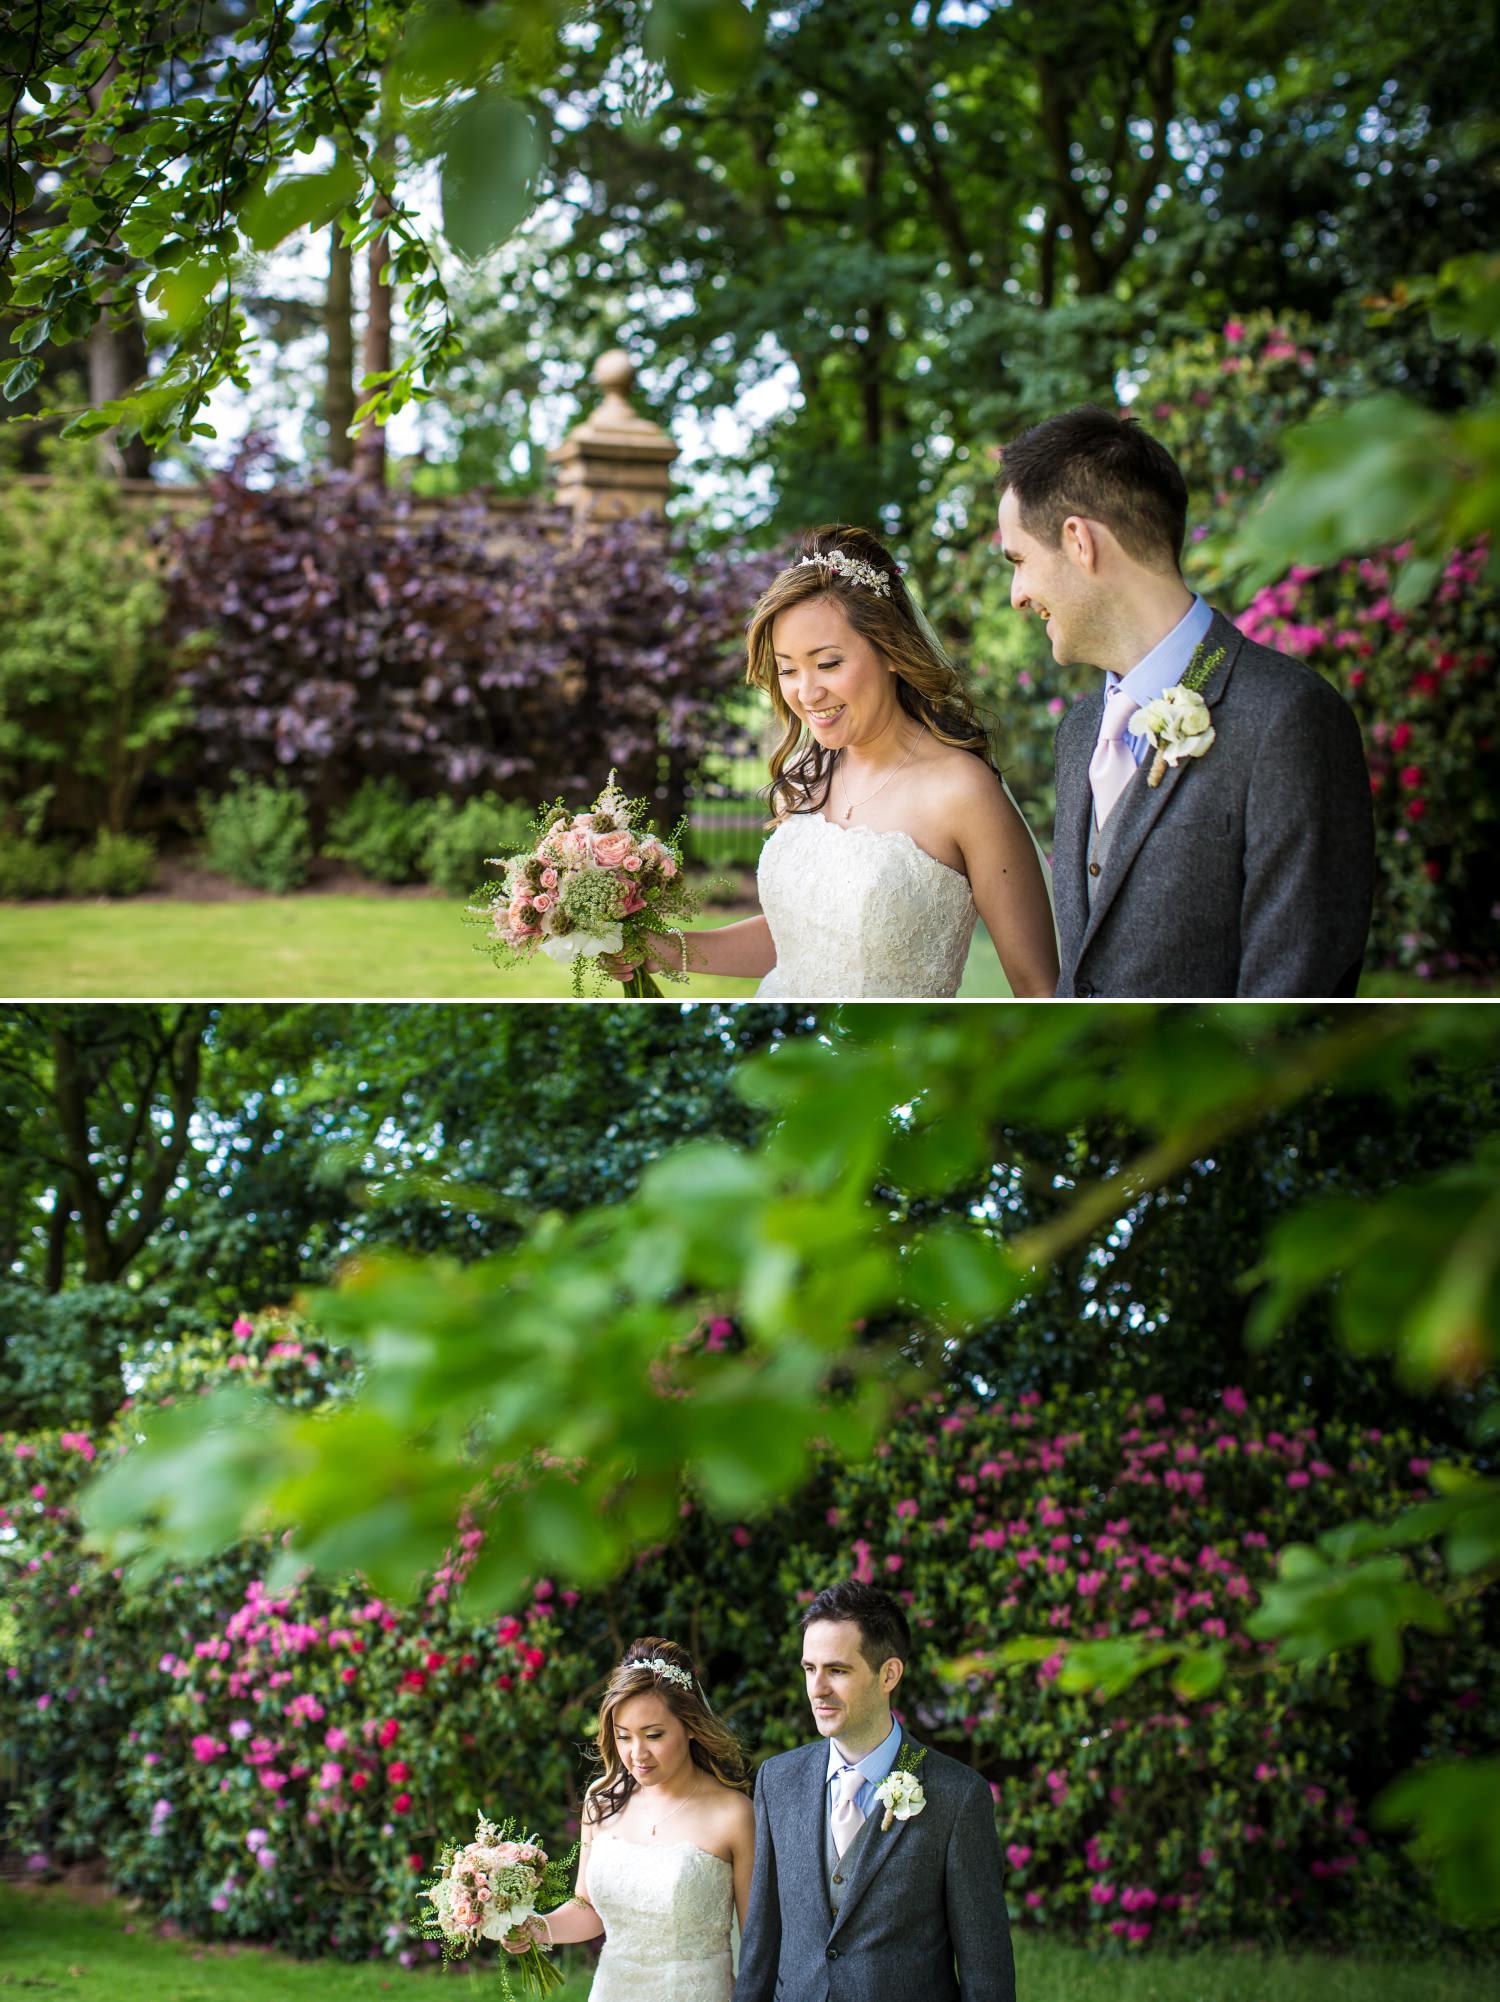 Wedding garden portraits, photographs of bride and groom in Cheshire wedding venue Tatton Park